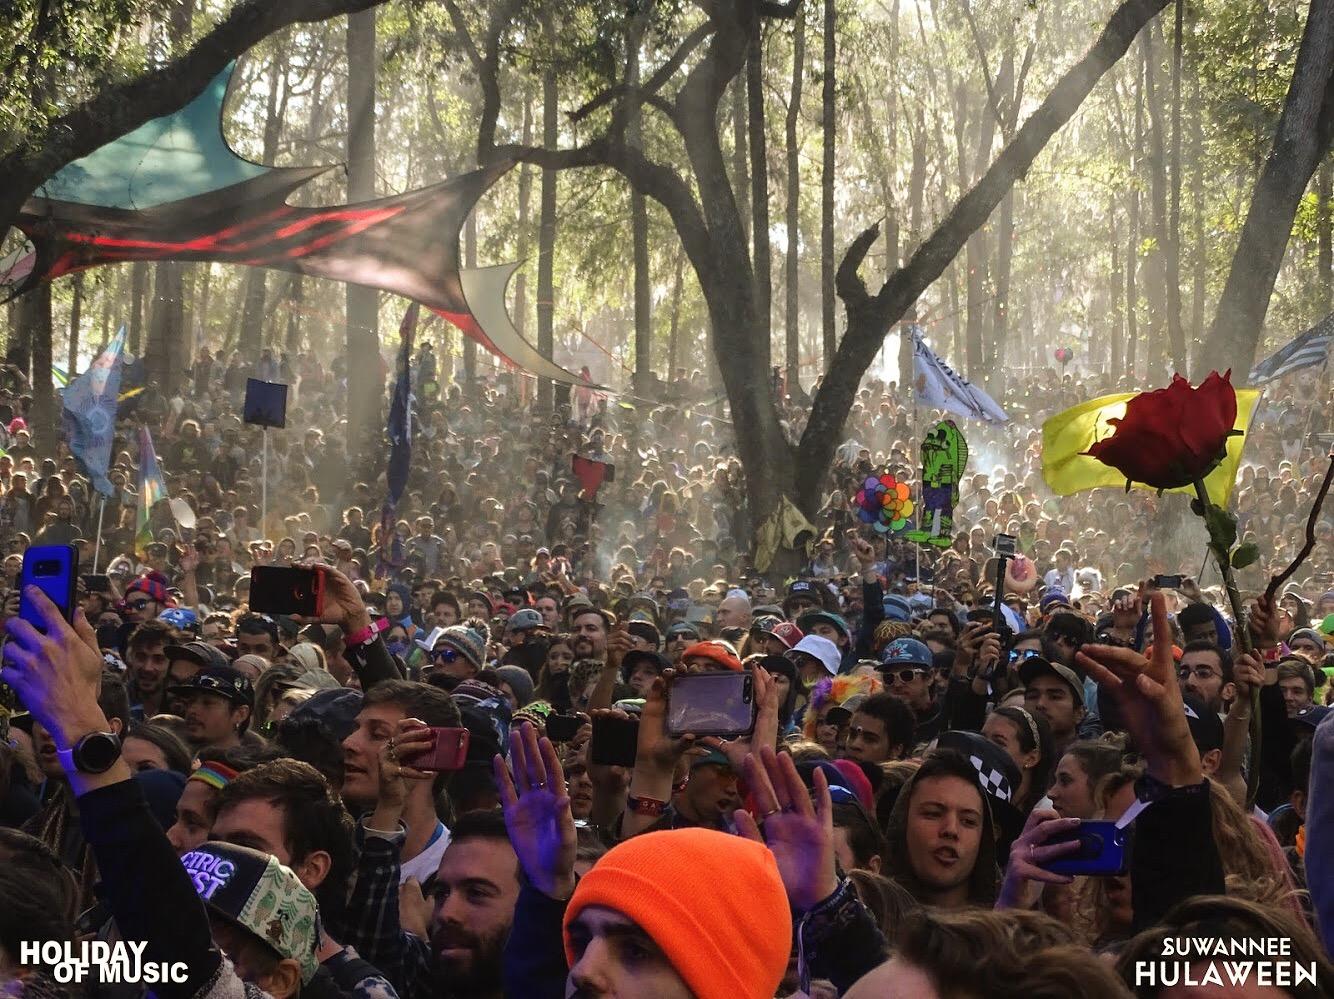 Portugal. The Man Crowd - Suwannee Hulaween 2017